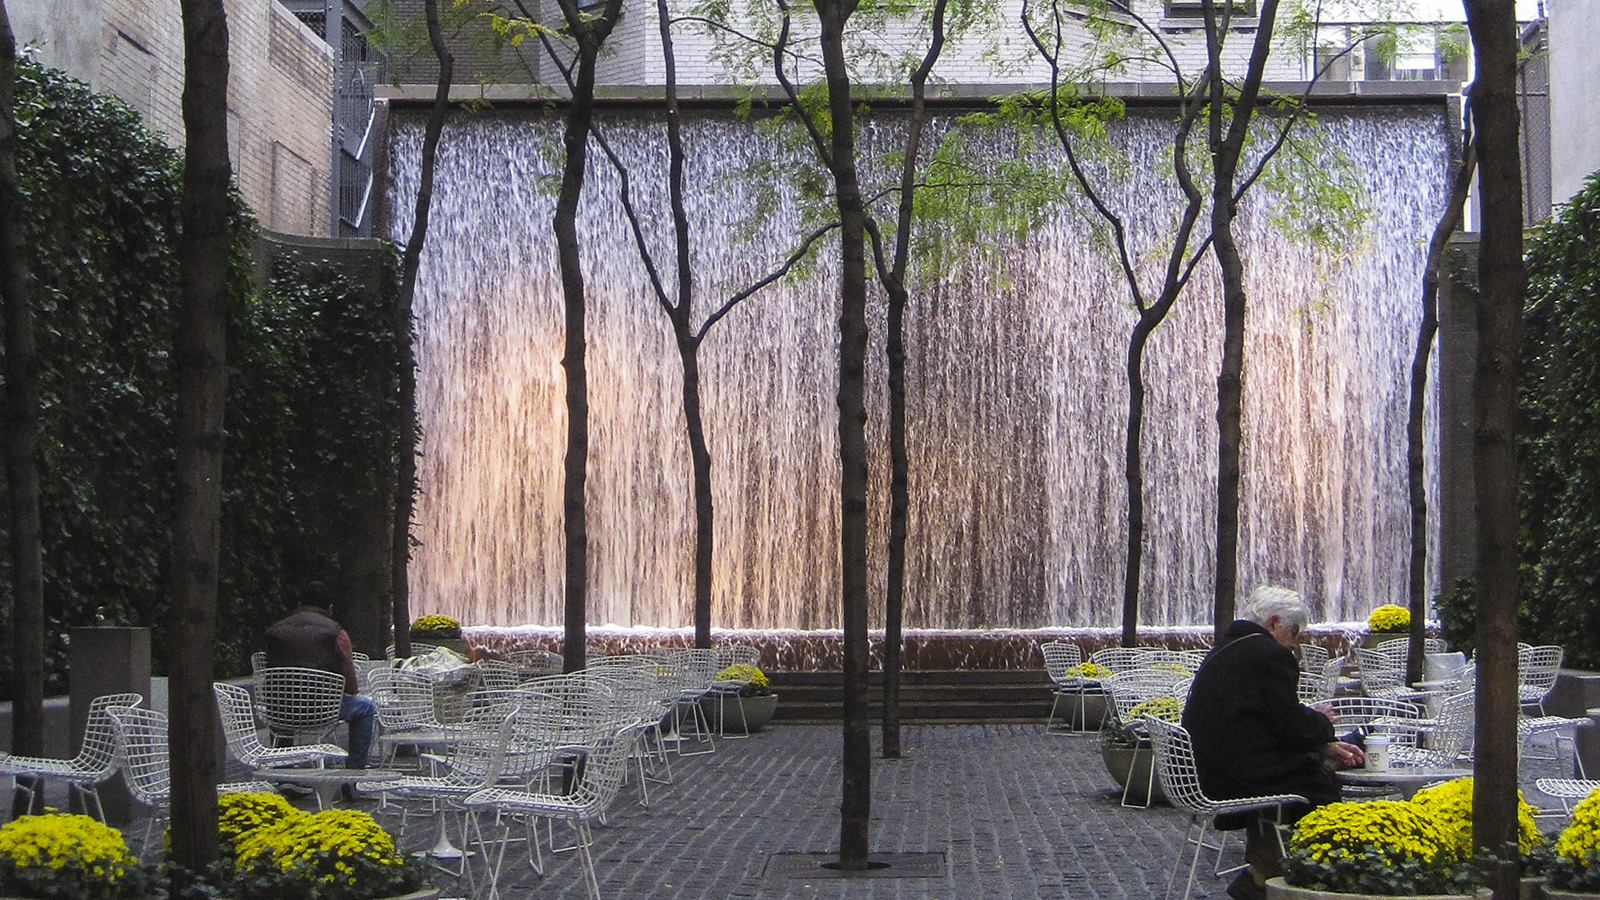 NY_NYC_PaleyPark_03_CharlesBirnbaum_2010_Signature.jpg